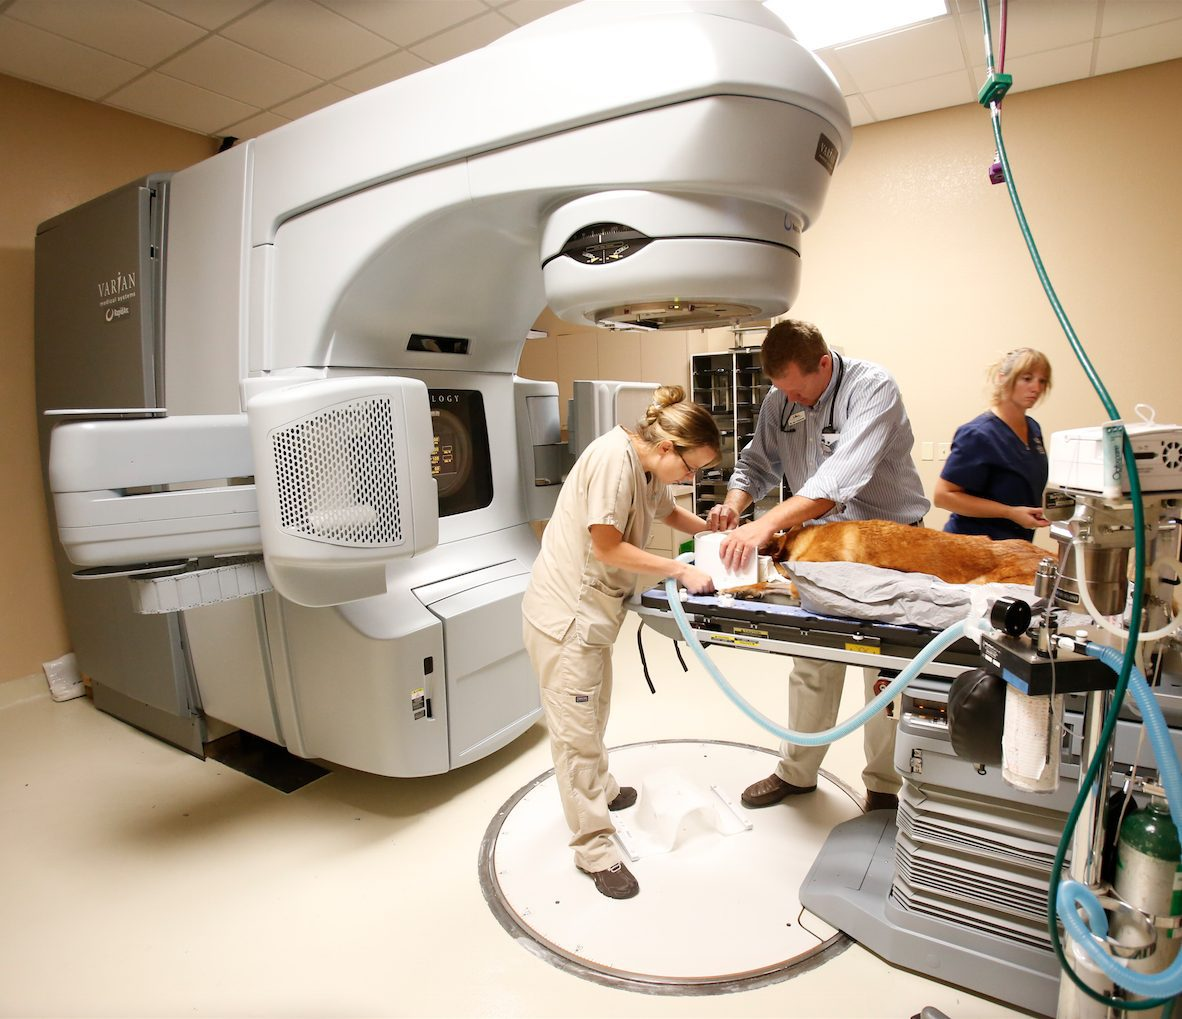 Stereotactic radiosurgery at Arizona Veterinary Oncology